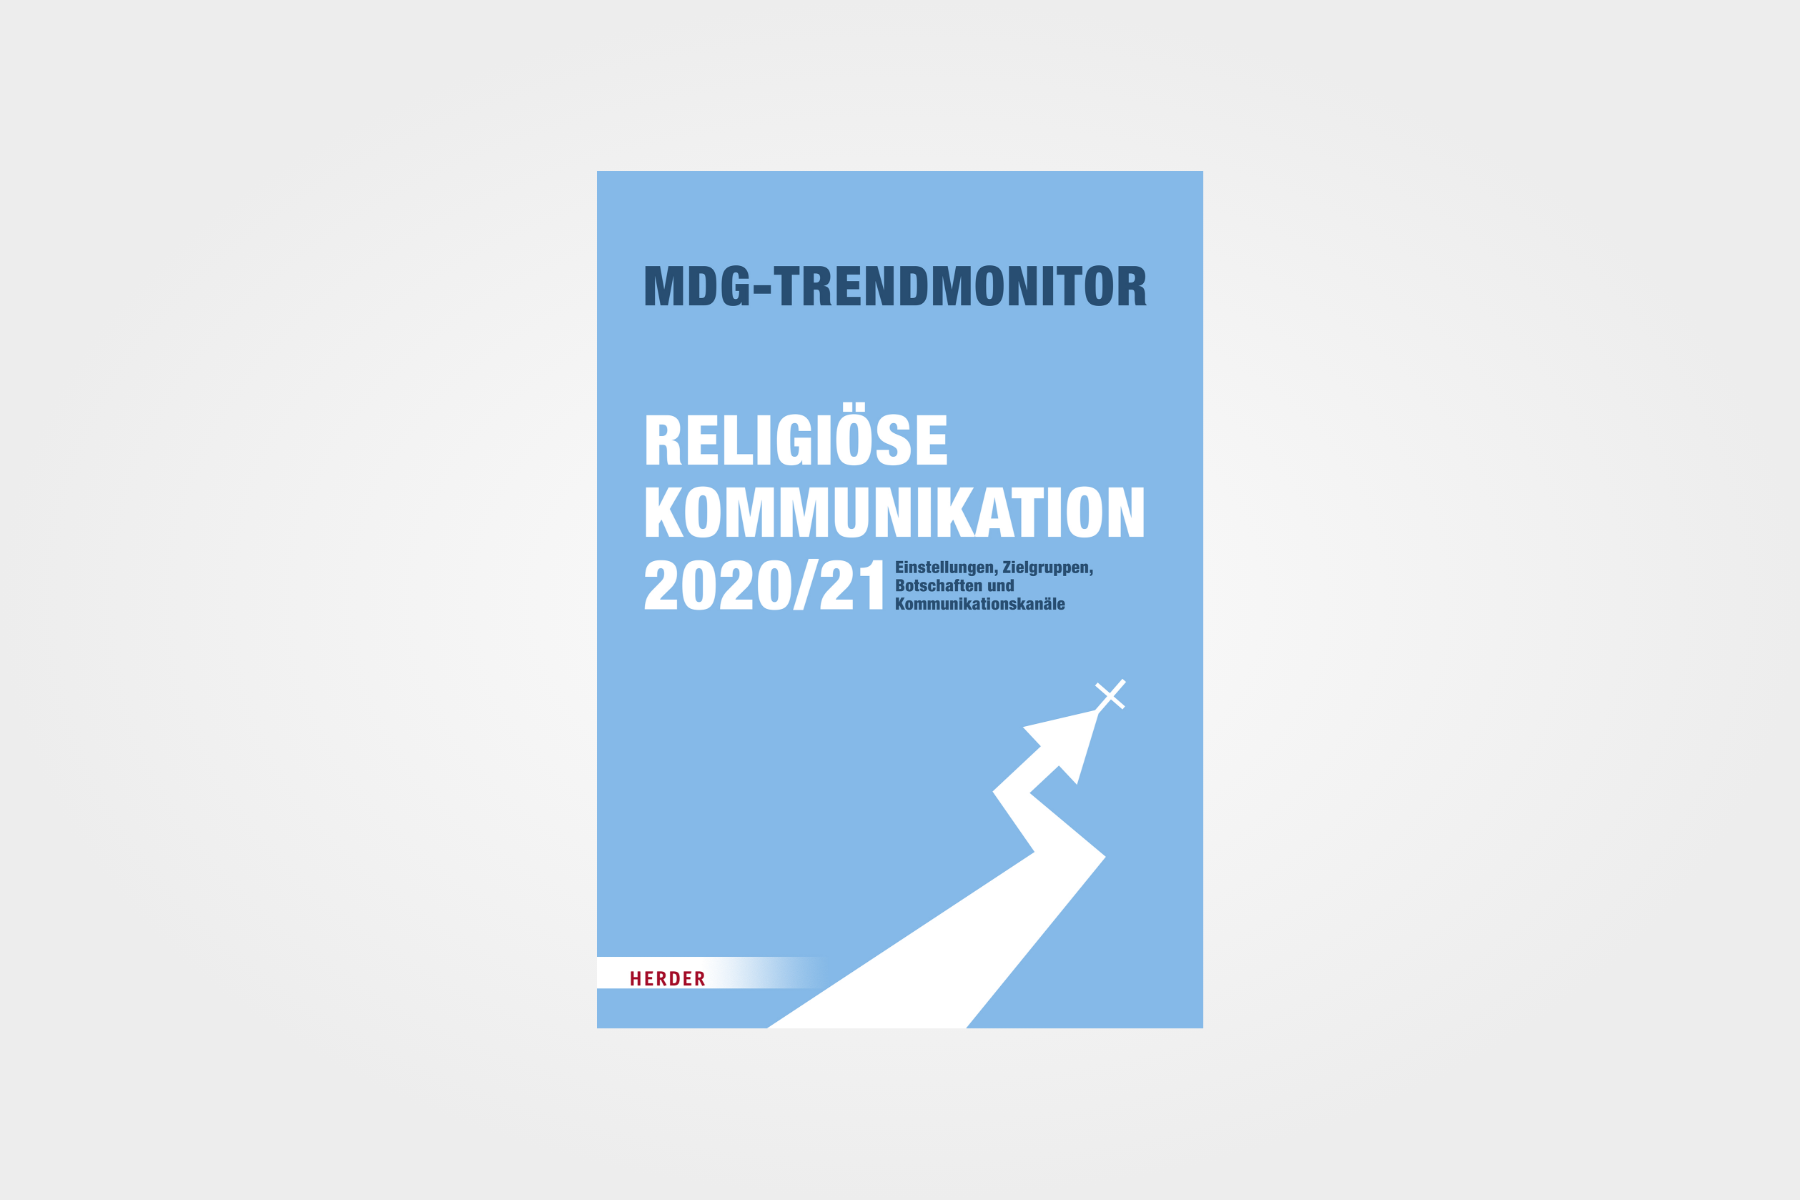 MDG-Trendmonitor - Religiöse Kommunikation 2020/21